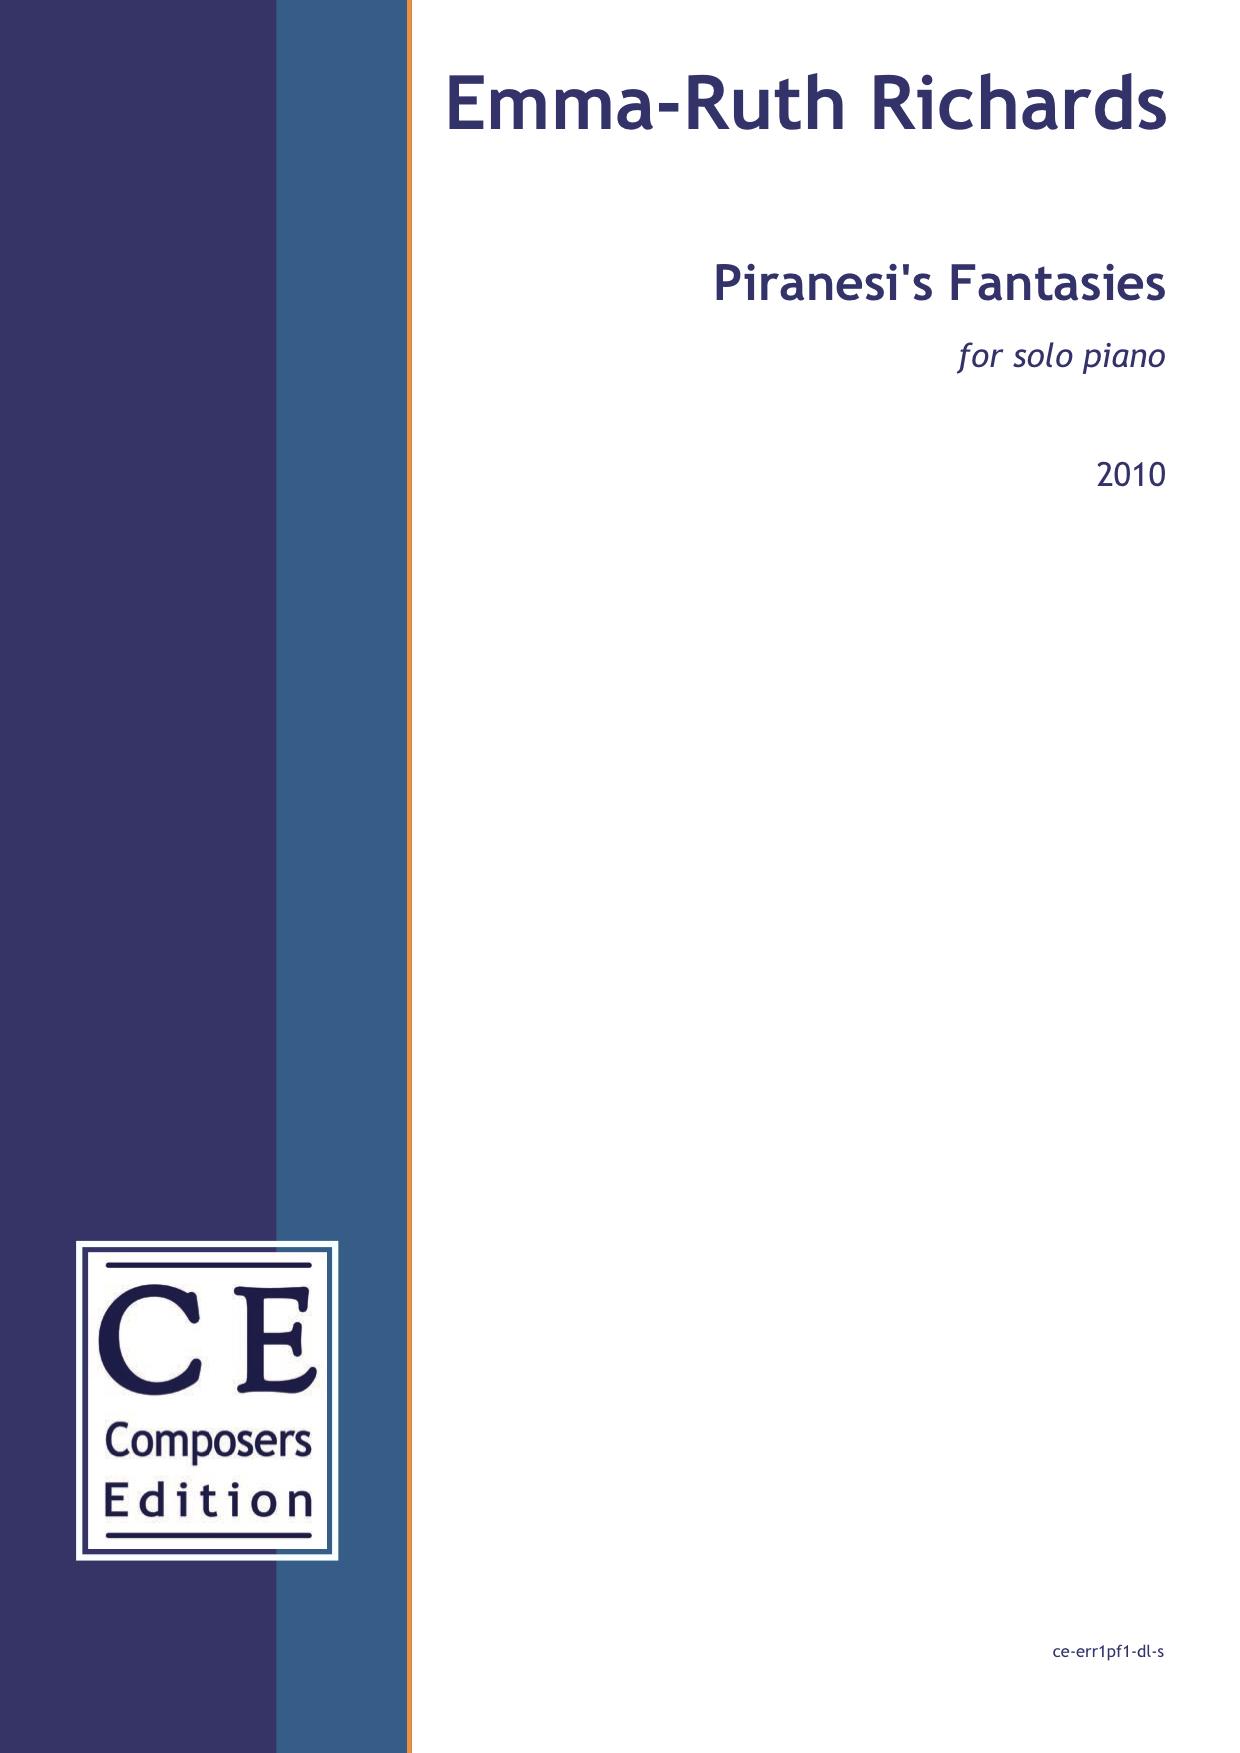 Emma-Ruth Richards: Piranesi's Fantasies for solo piano